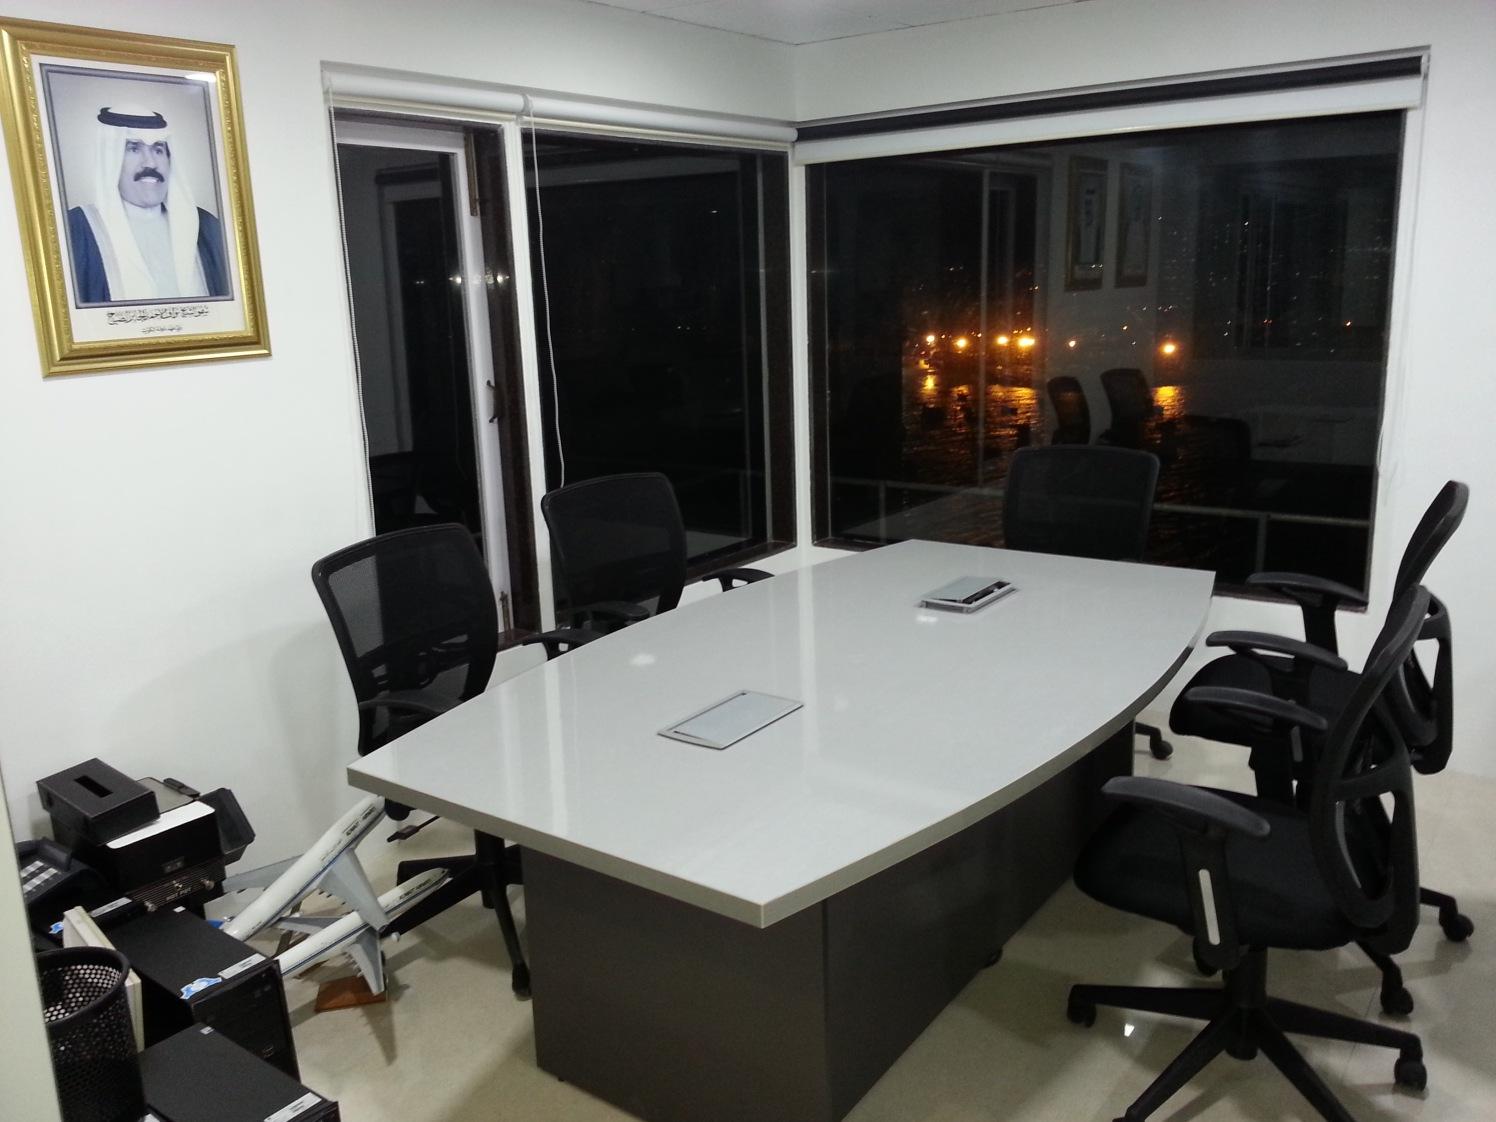 Basic Room Office by Vinod Kalburgi Modern | Interior Design Photos & Ideas